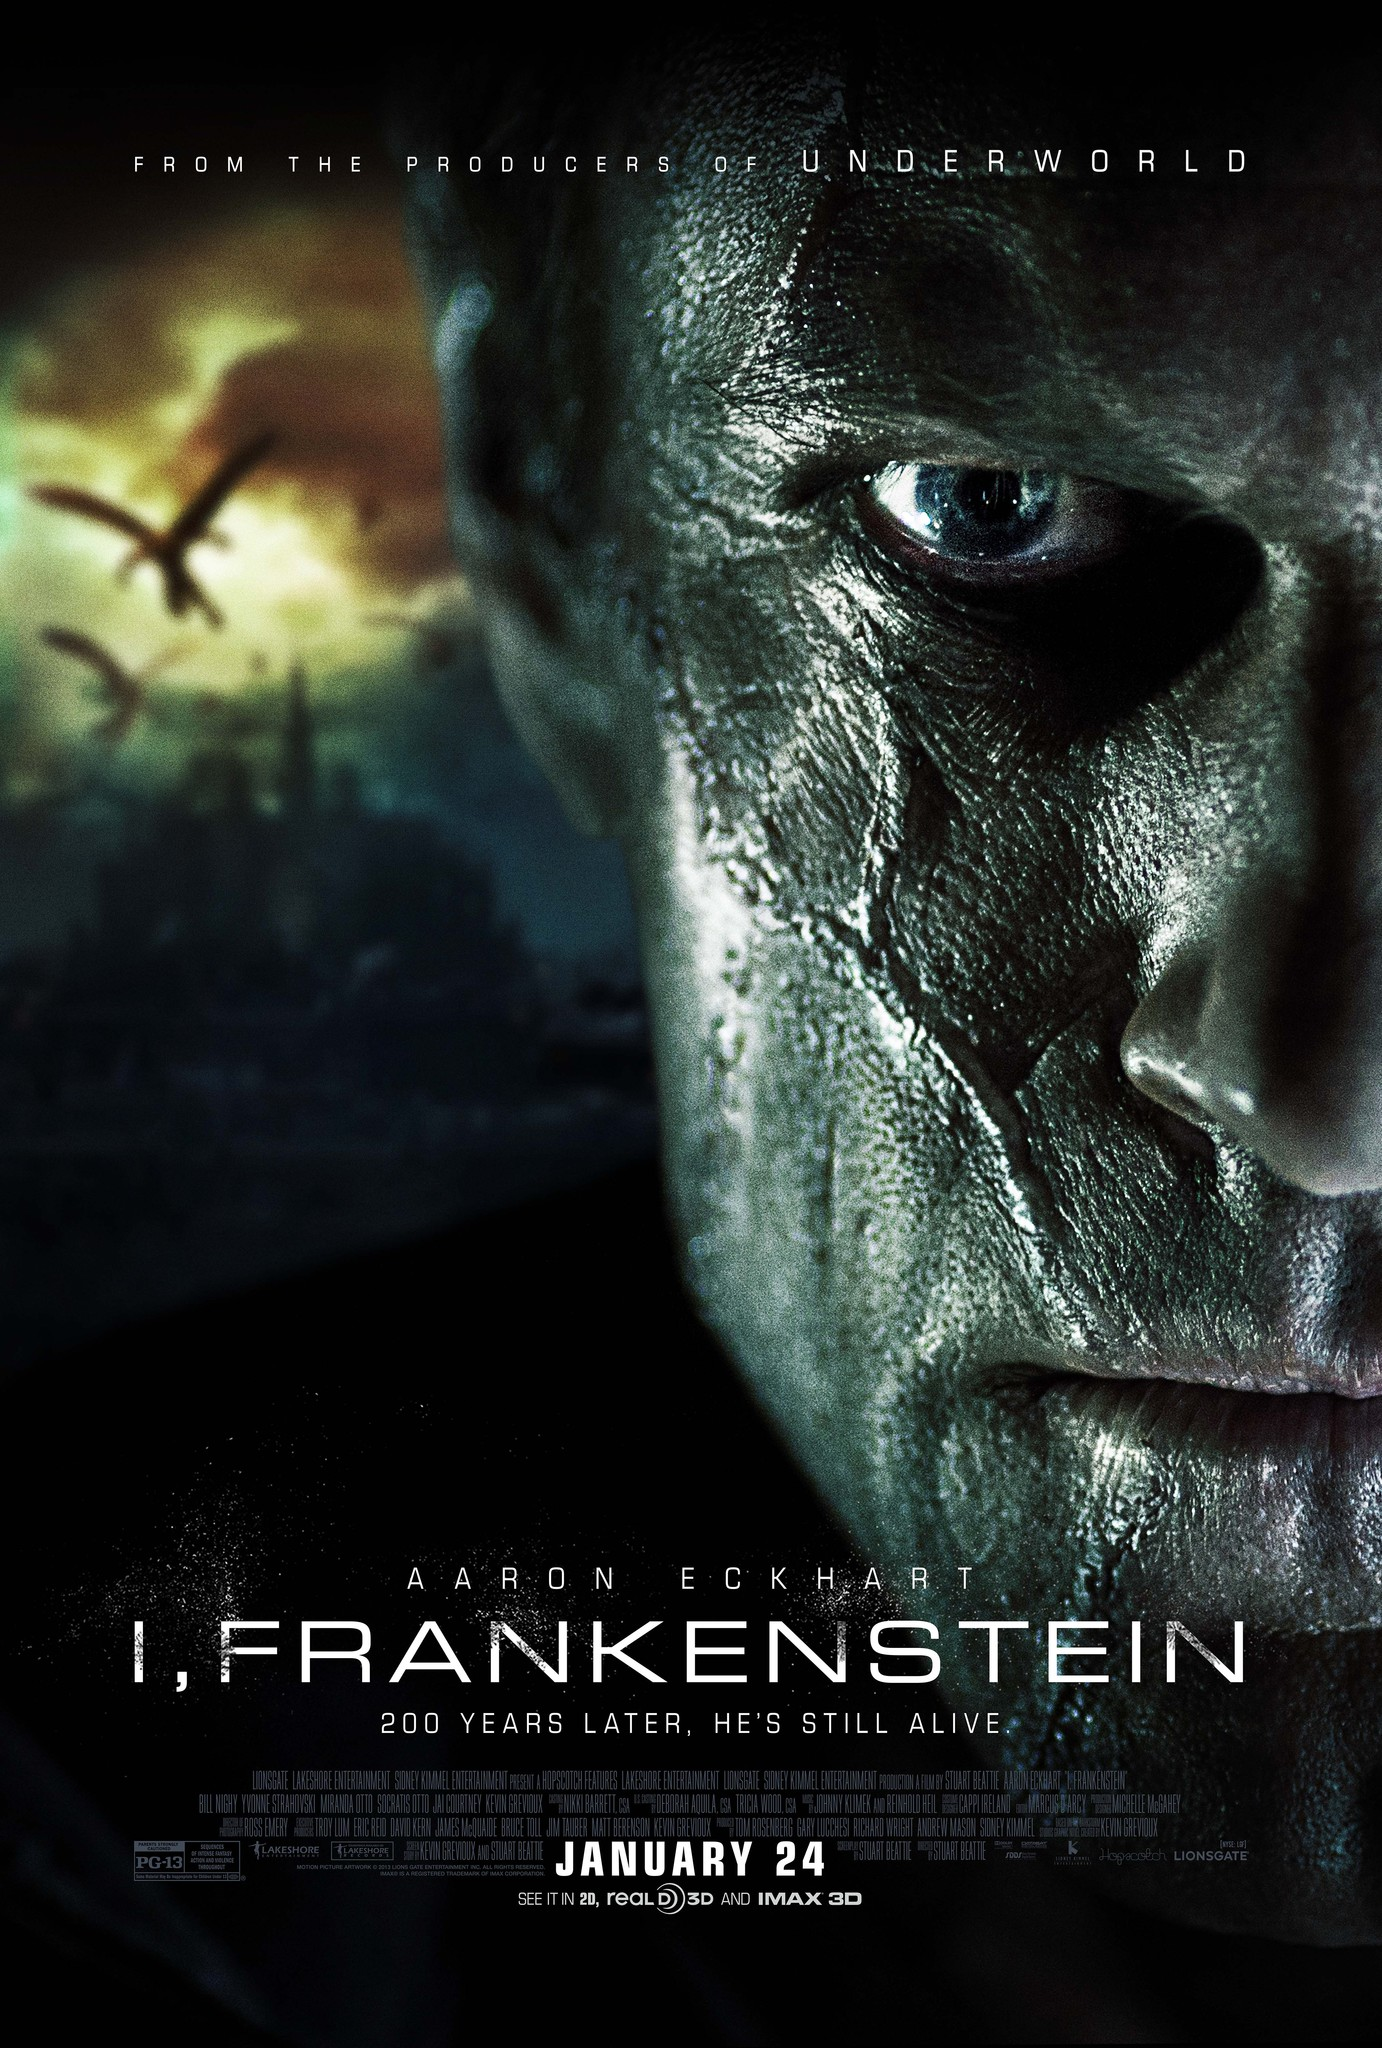 Frankenstein: Entre Anjos e Demônios [Dub] – IMDB 5.1